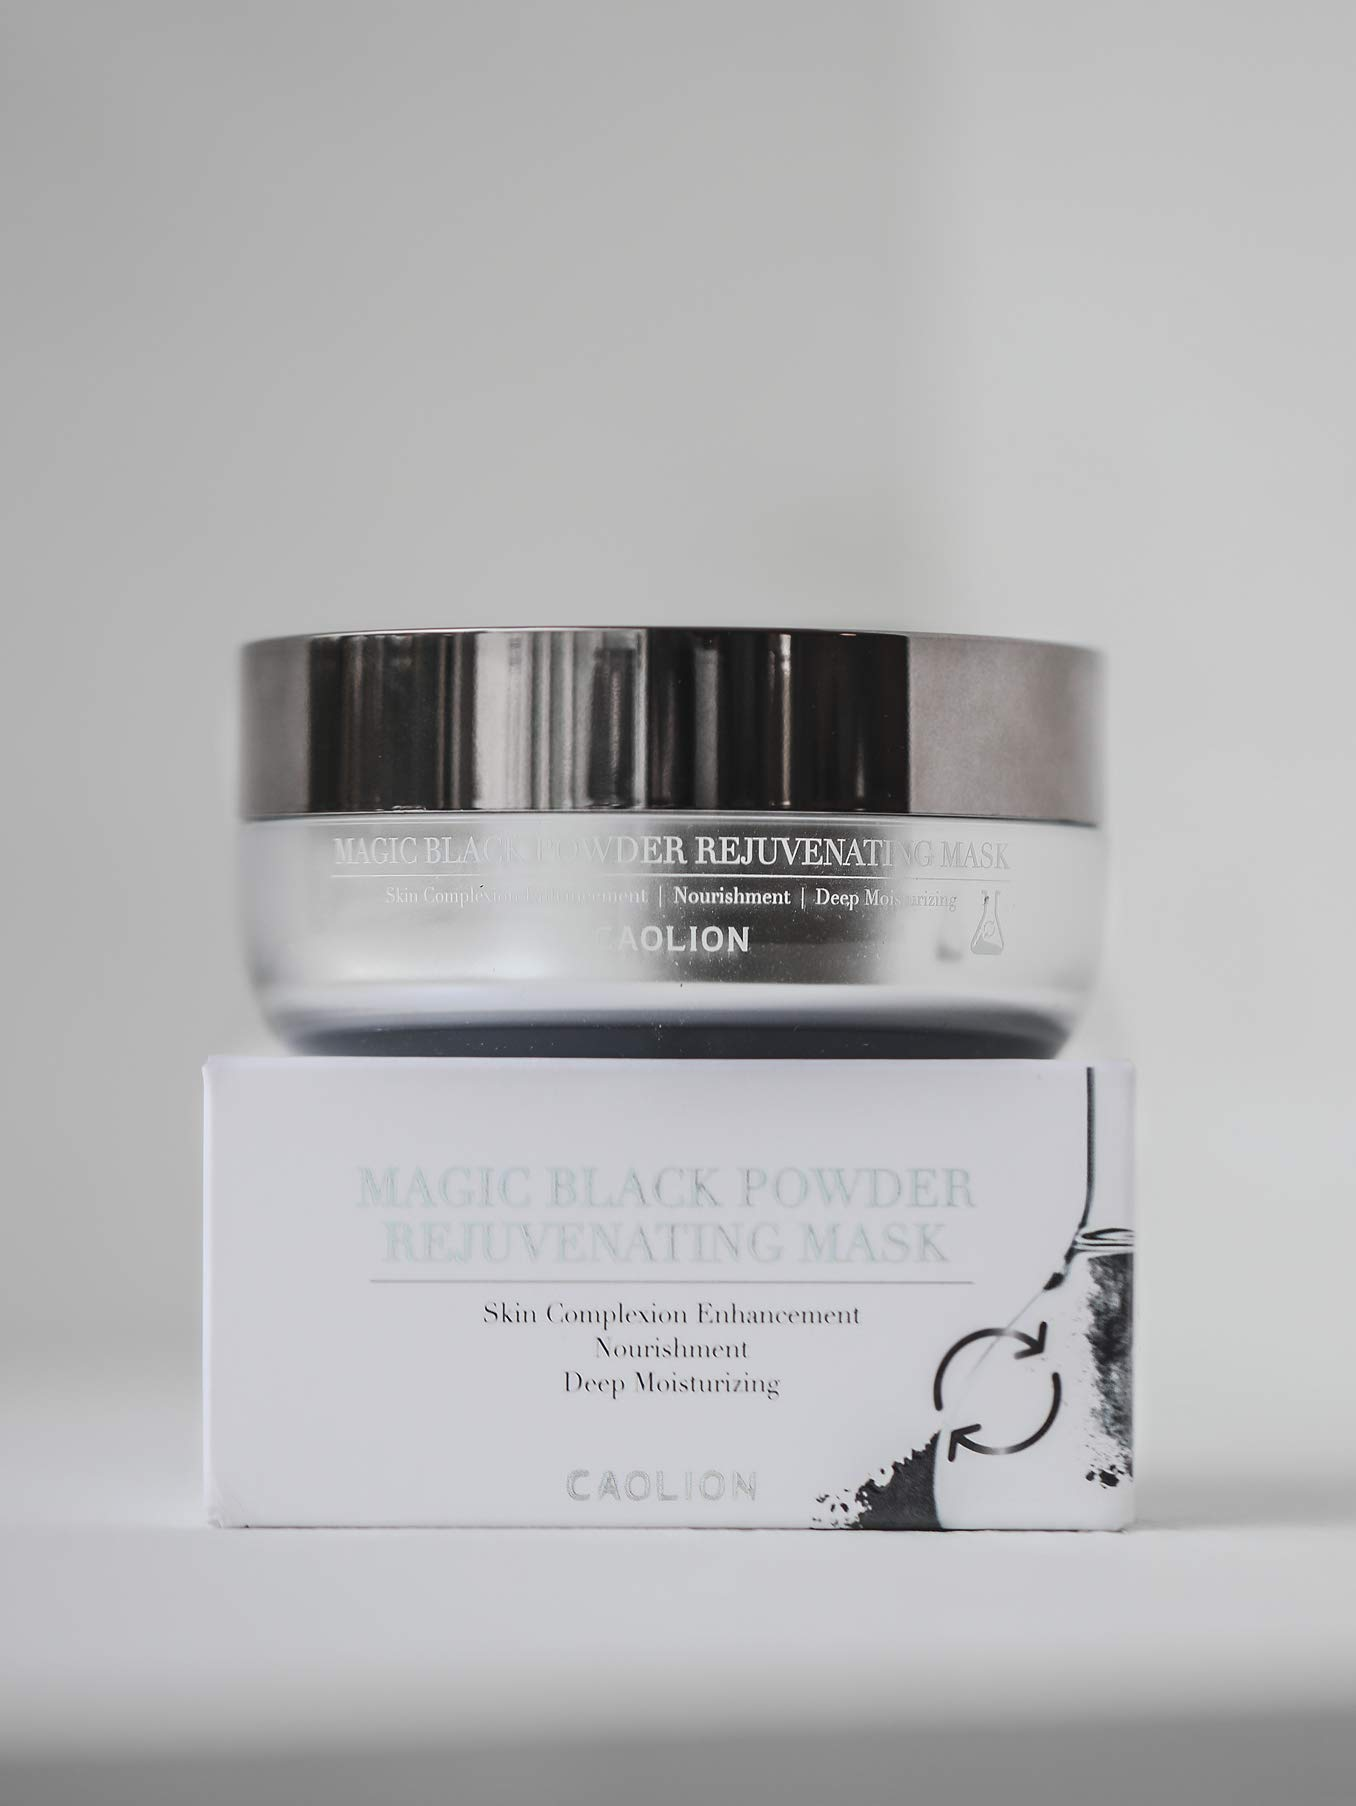 Caolion Magic Black Powder Rejuvenating Mask - Enhances Complexion, Nourishing, Deep Moisturizing - 1.76 oz.